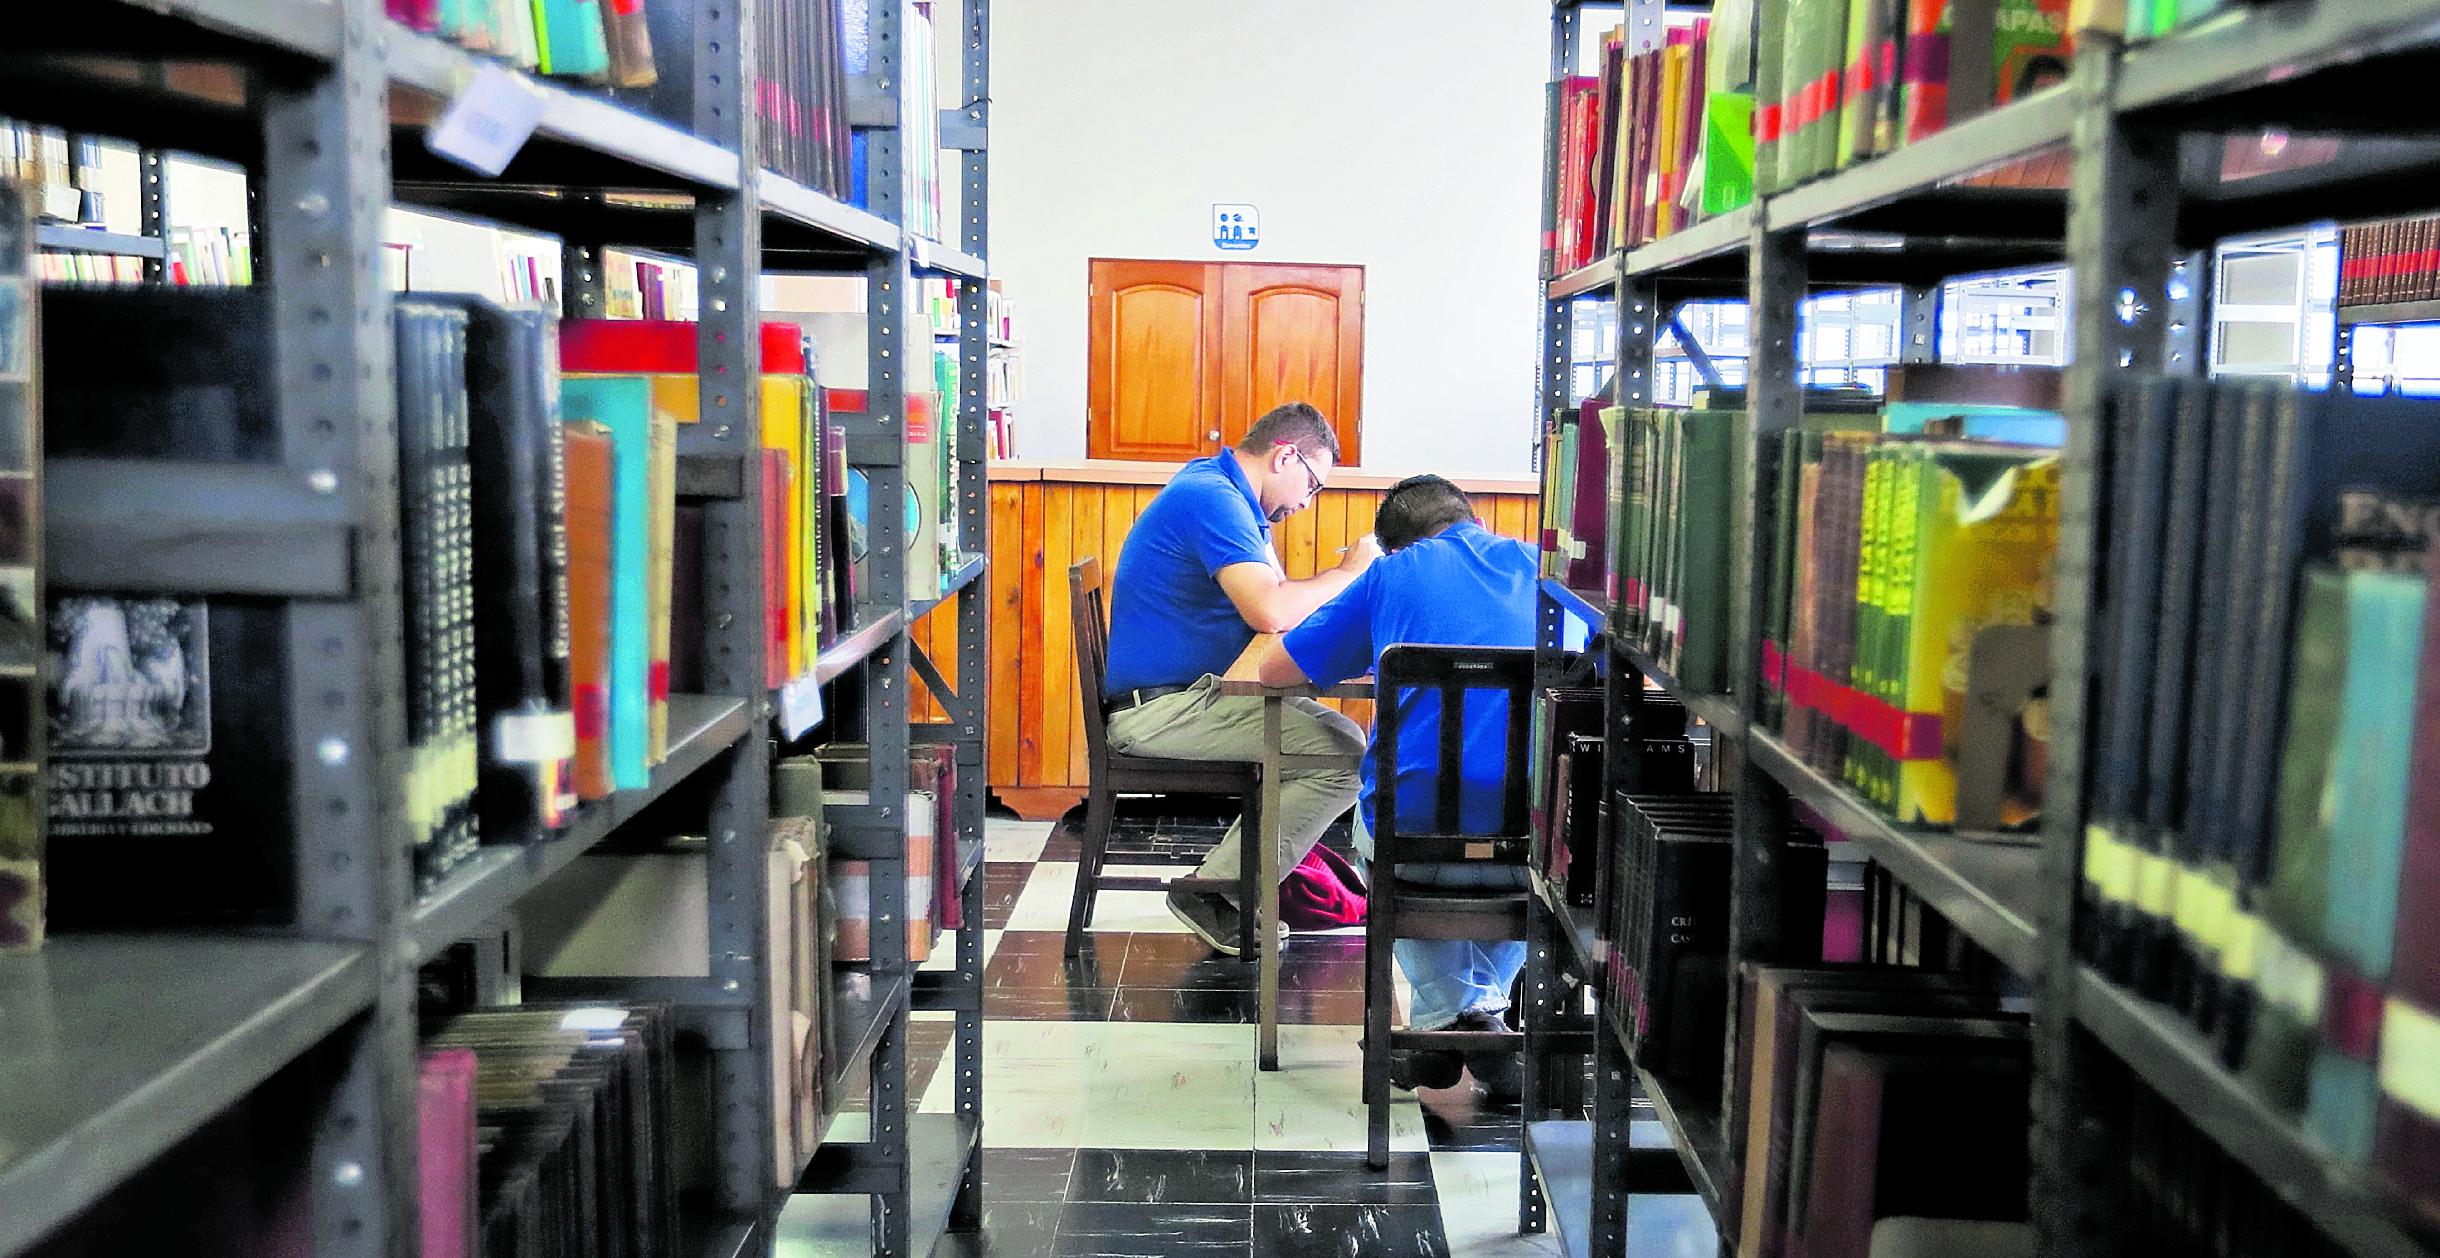 Las bibliotecas especializadas podrán ser habilitadas por particulares o entidades.(Foto Prensa Libre: Hemeroteca PL)